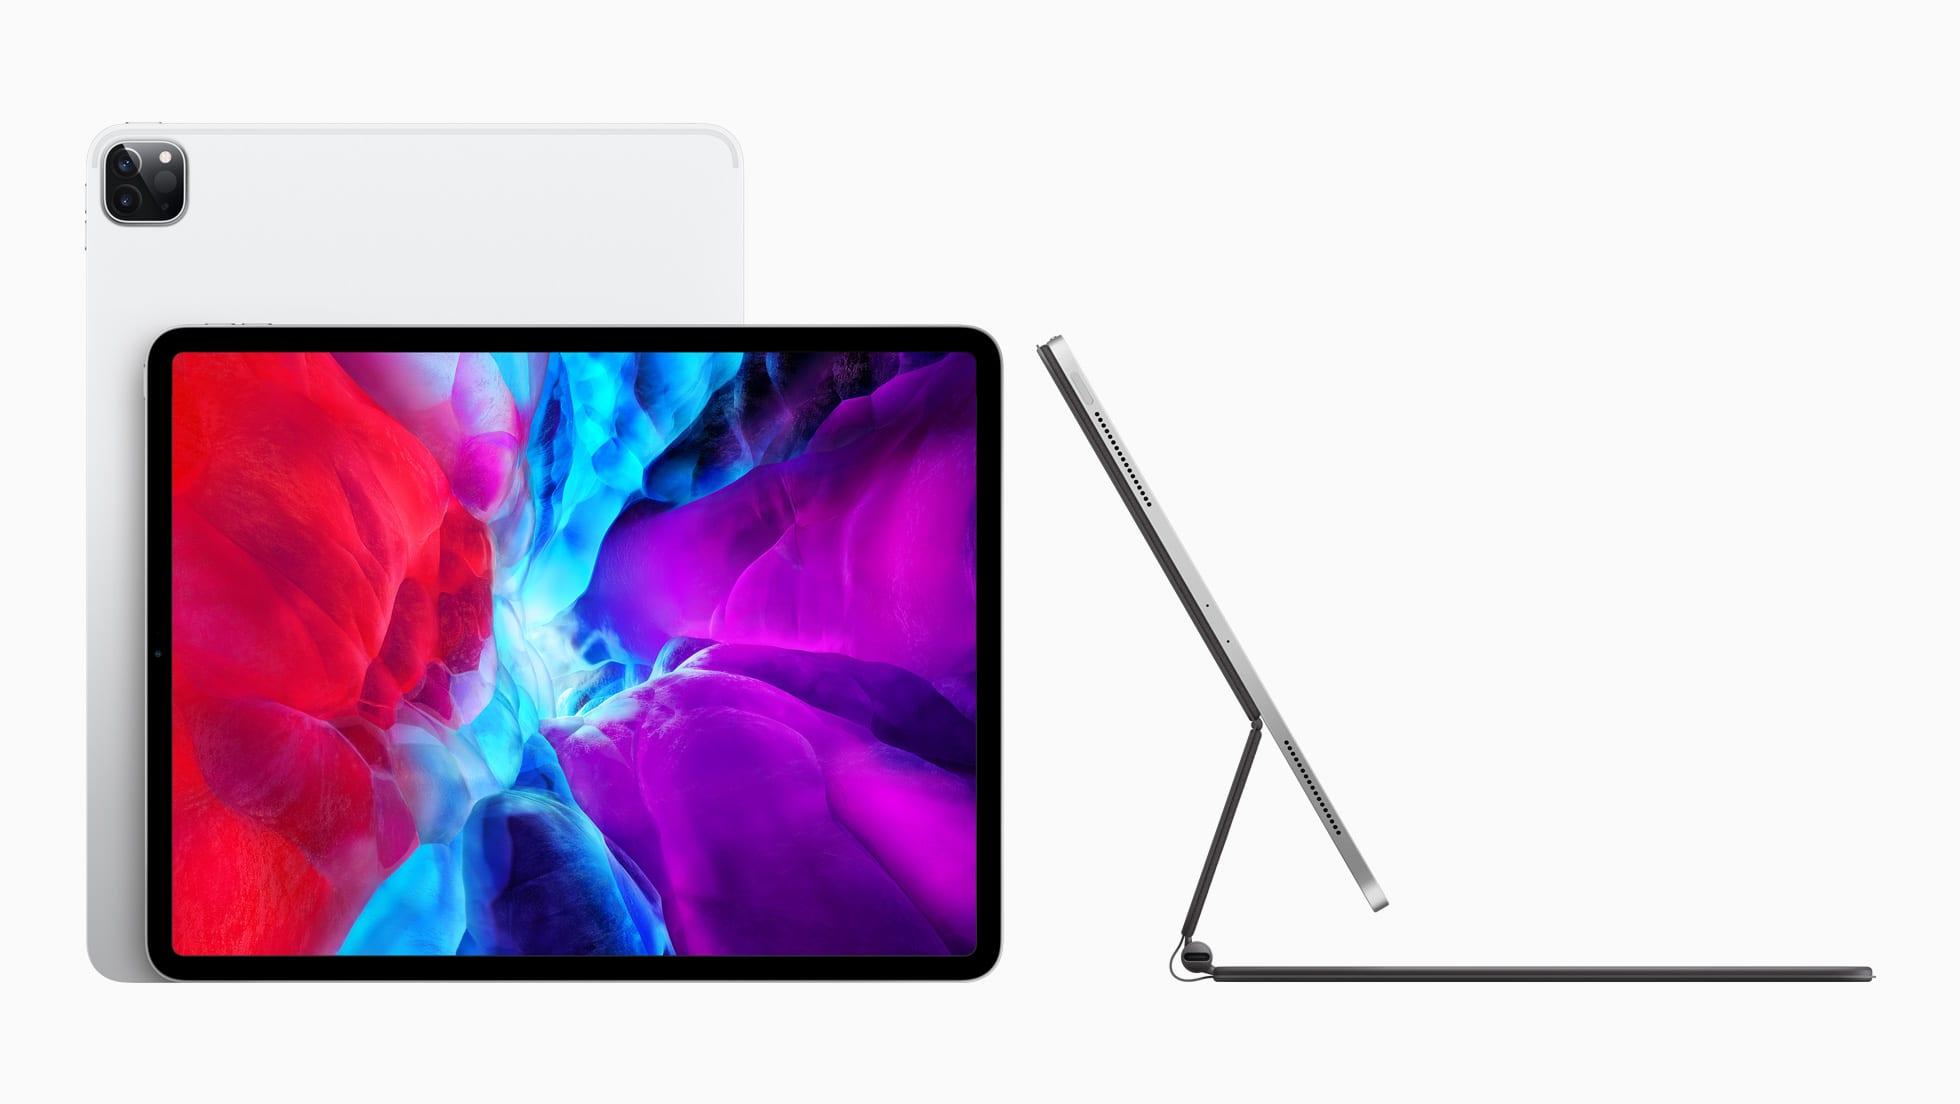 iPad Pro 3rd generation 2020